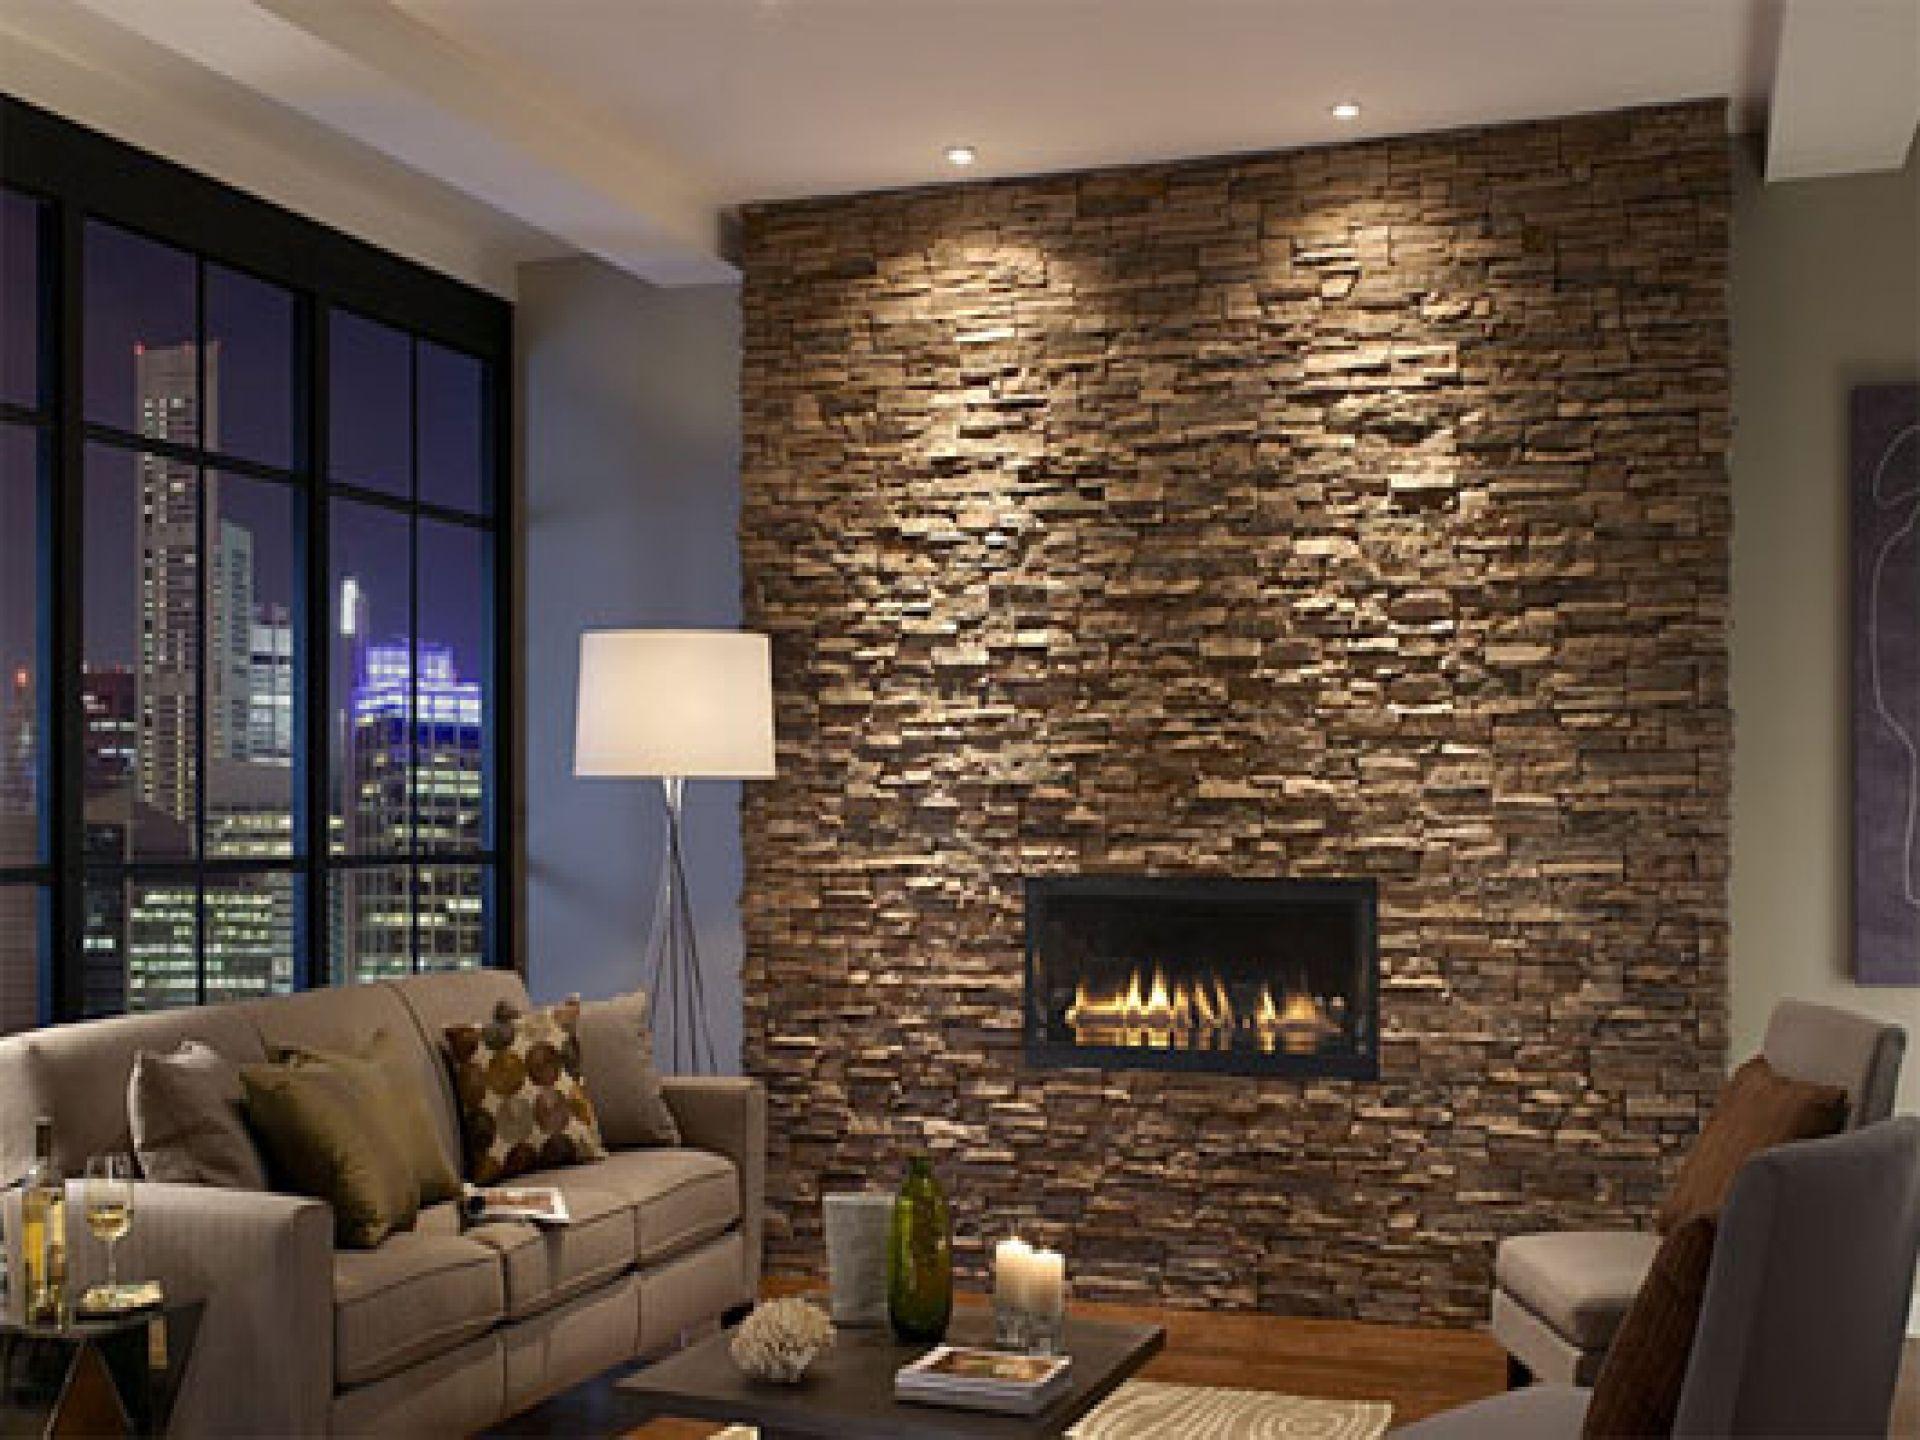 Stylish Design Interior Design Wall Decor By For Ideas Home